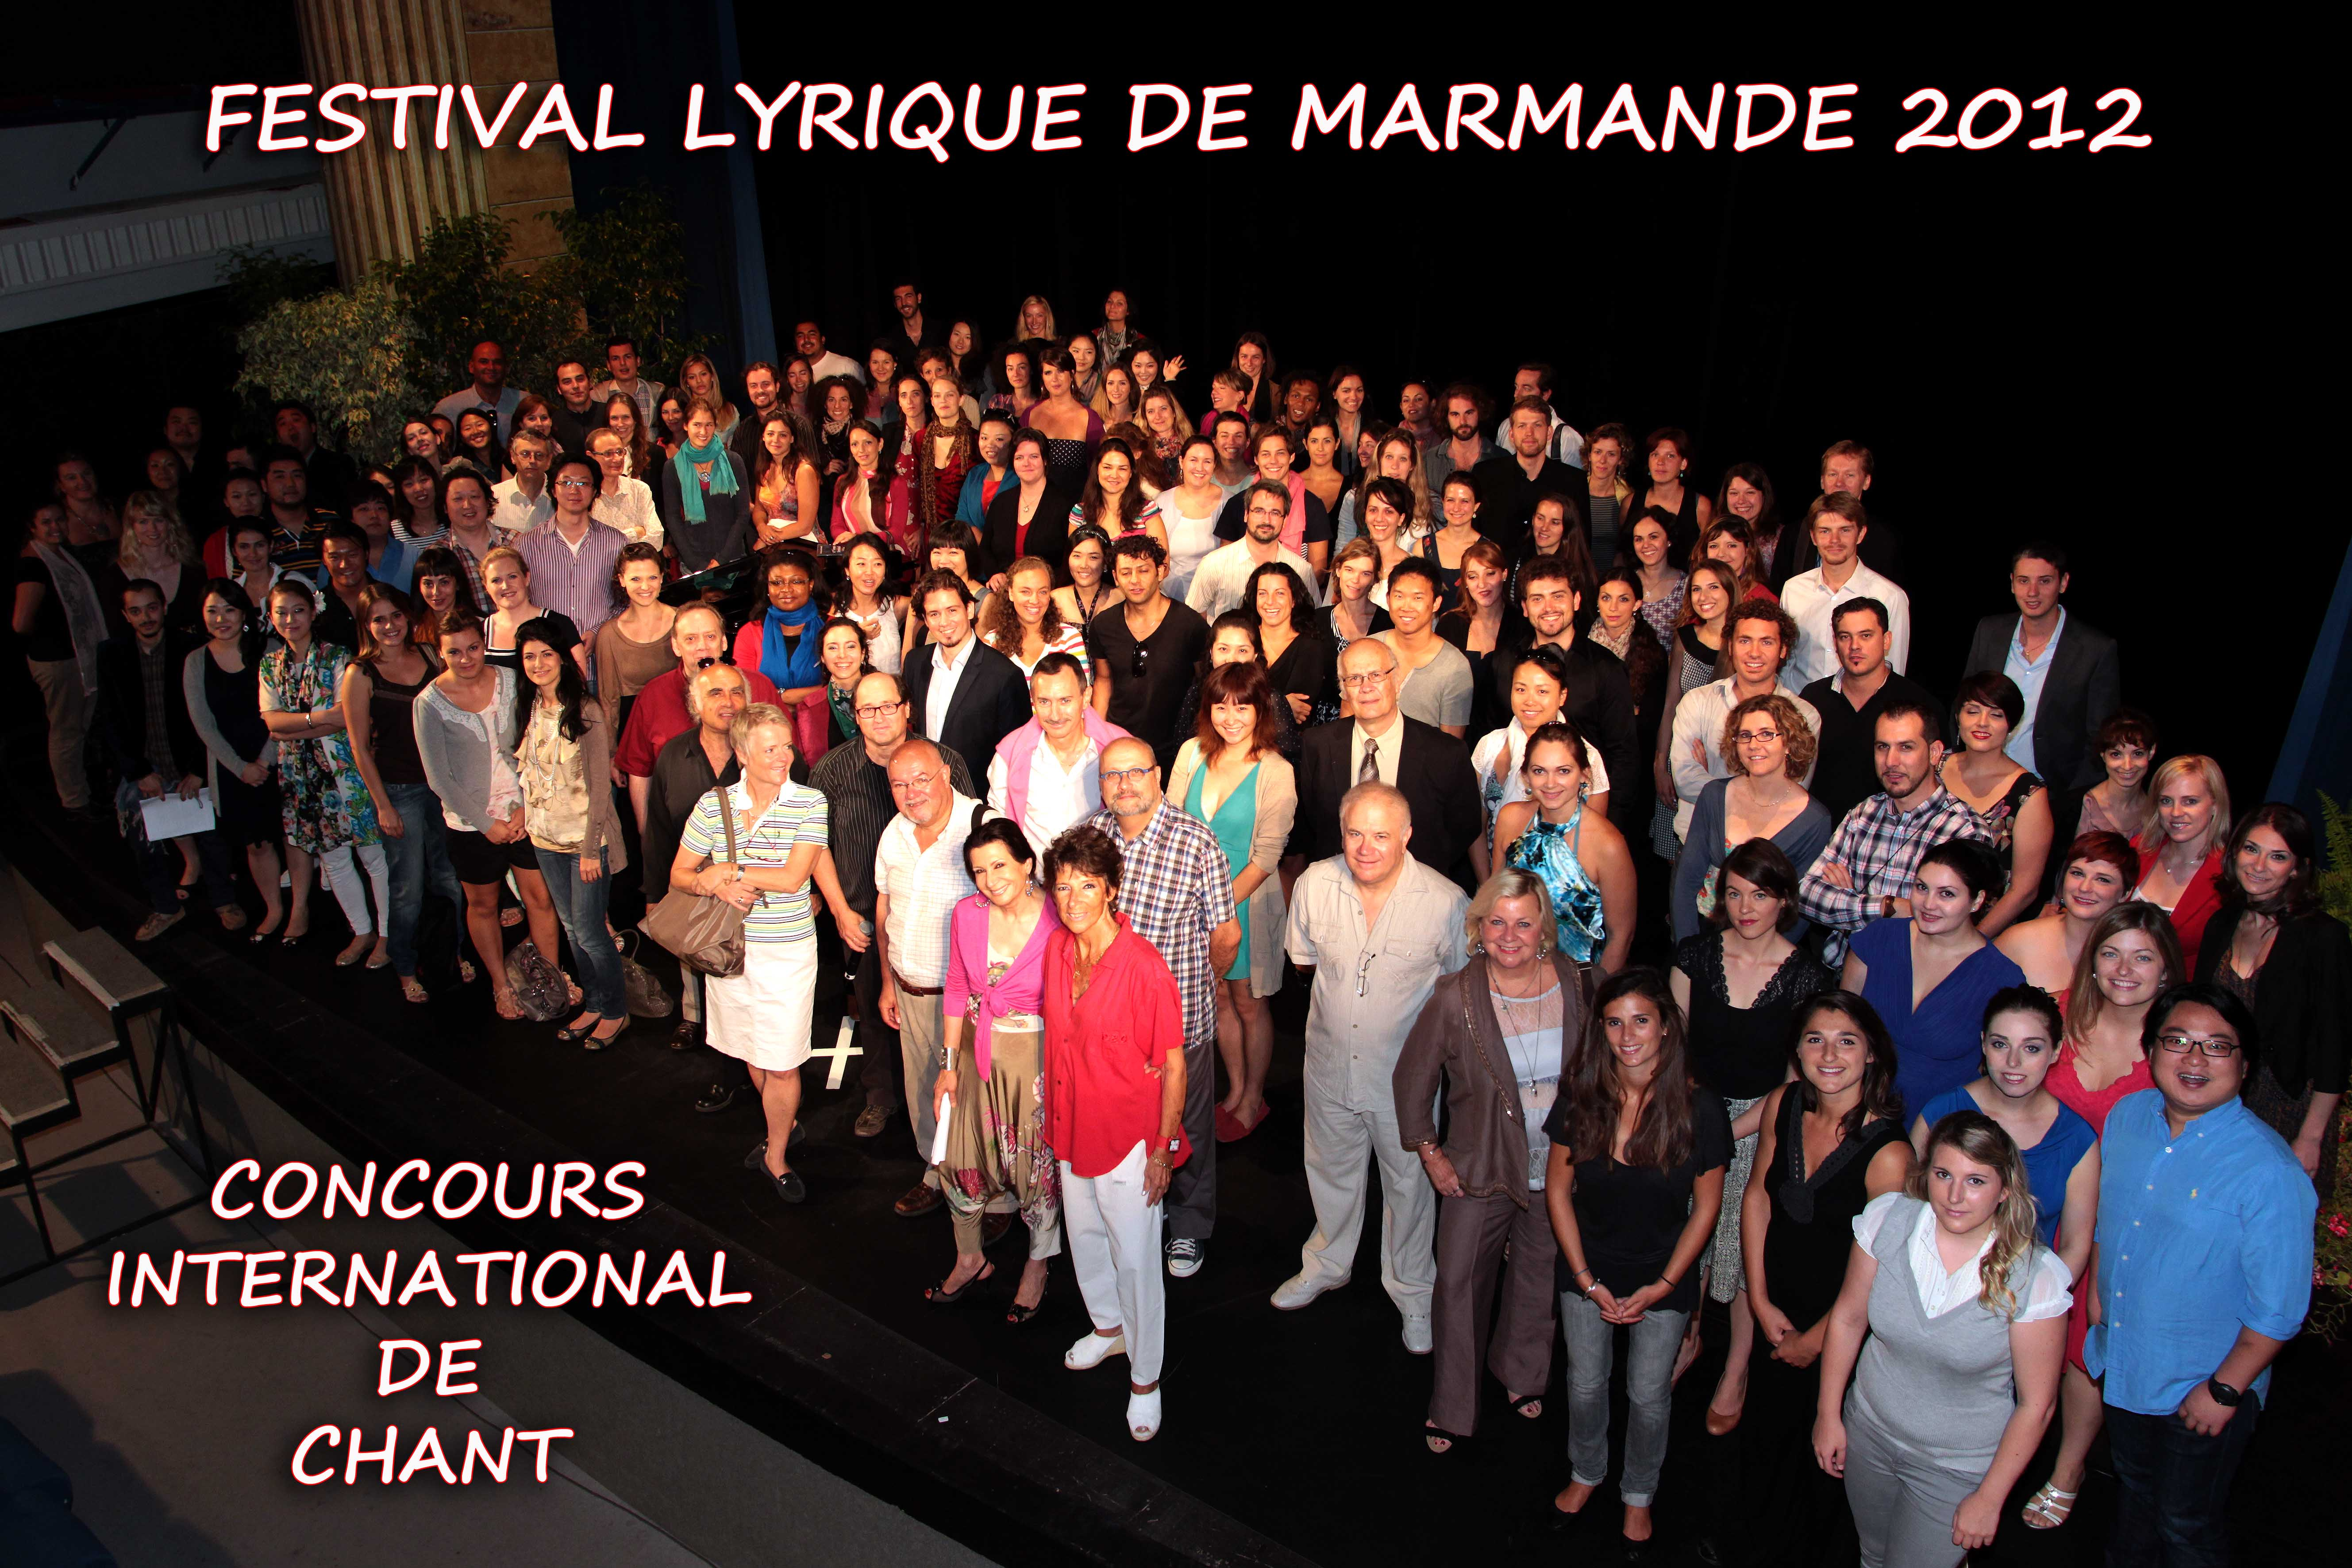 Marmande International Festival